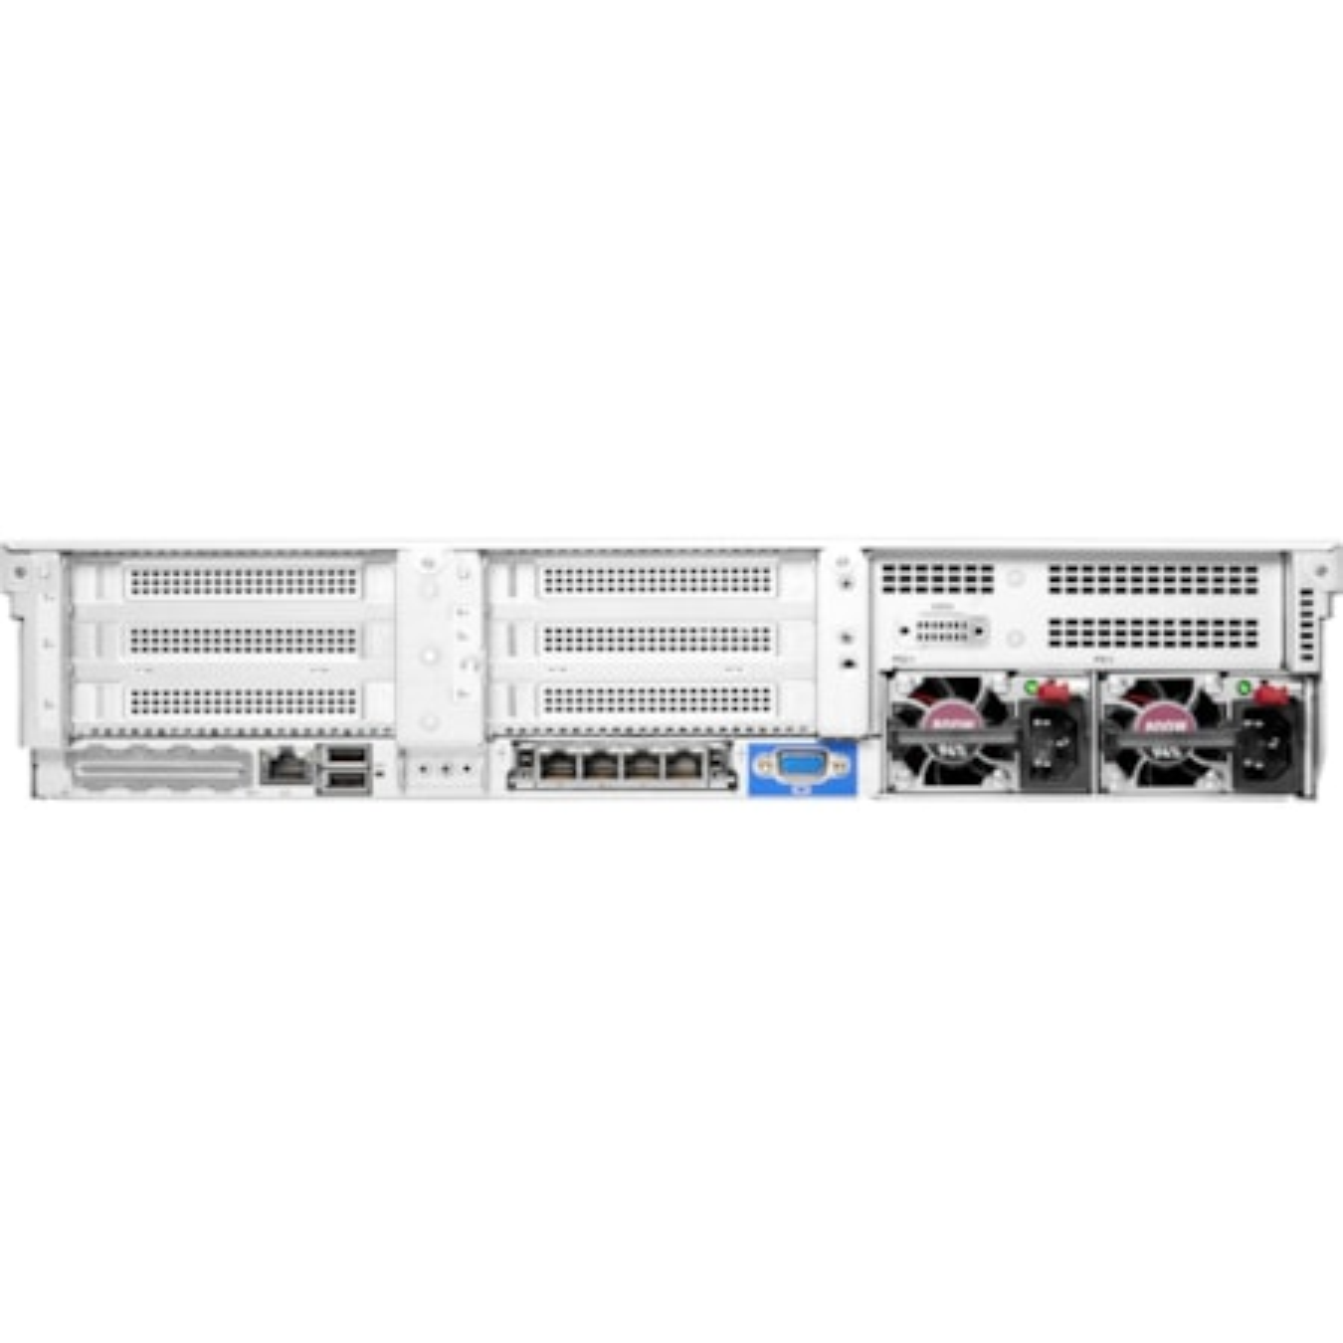 HPE ProLiant DL380 G10 Plus 2U Rack Server - 1 x Intel Xeon Silver 4314 2.40 GHz - 32 GB RAM - 12Gb/s SAS Controller